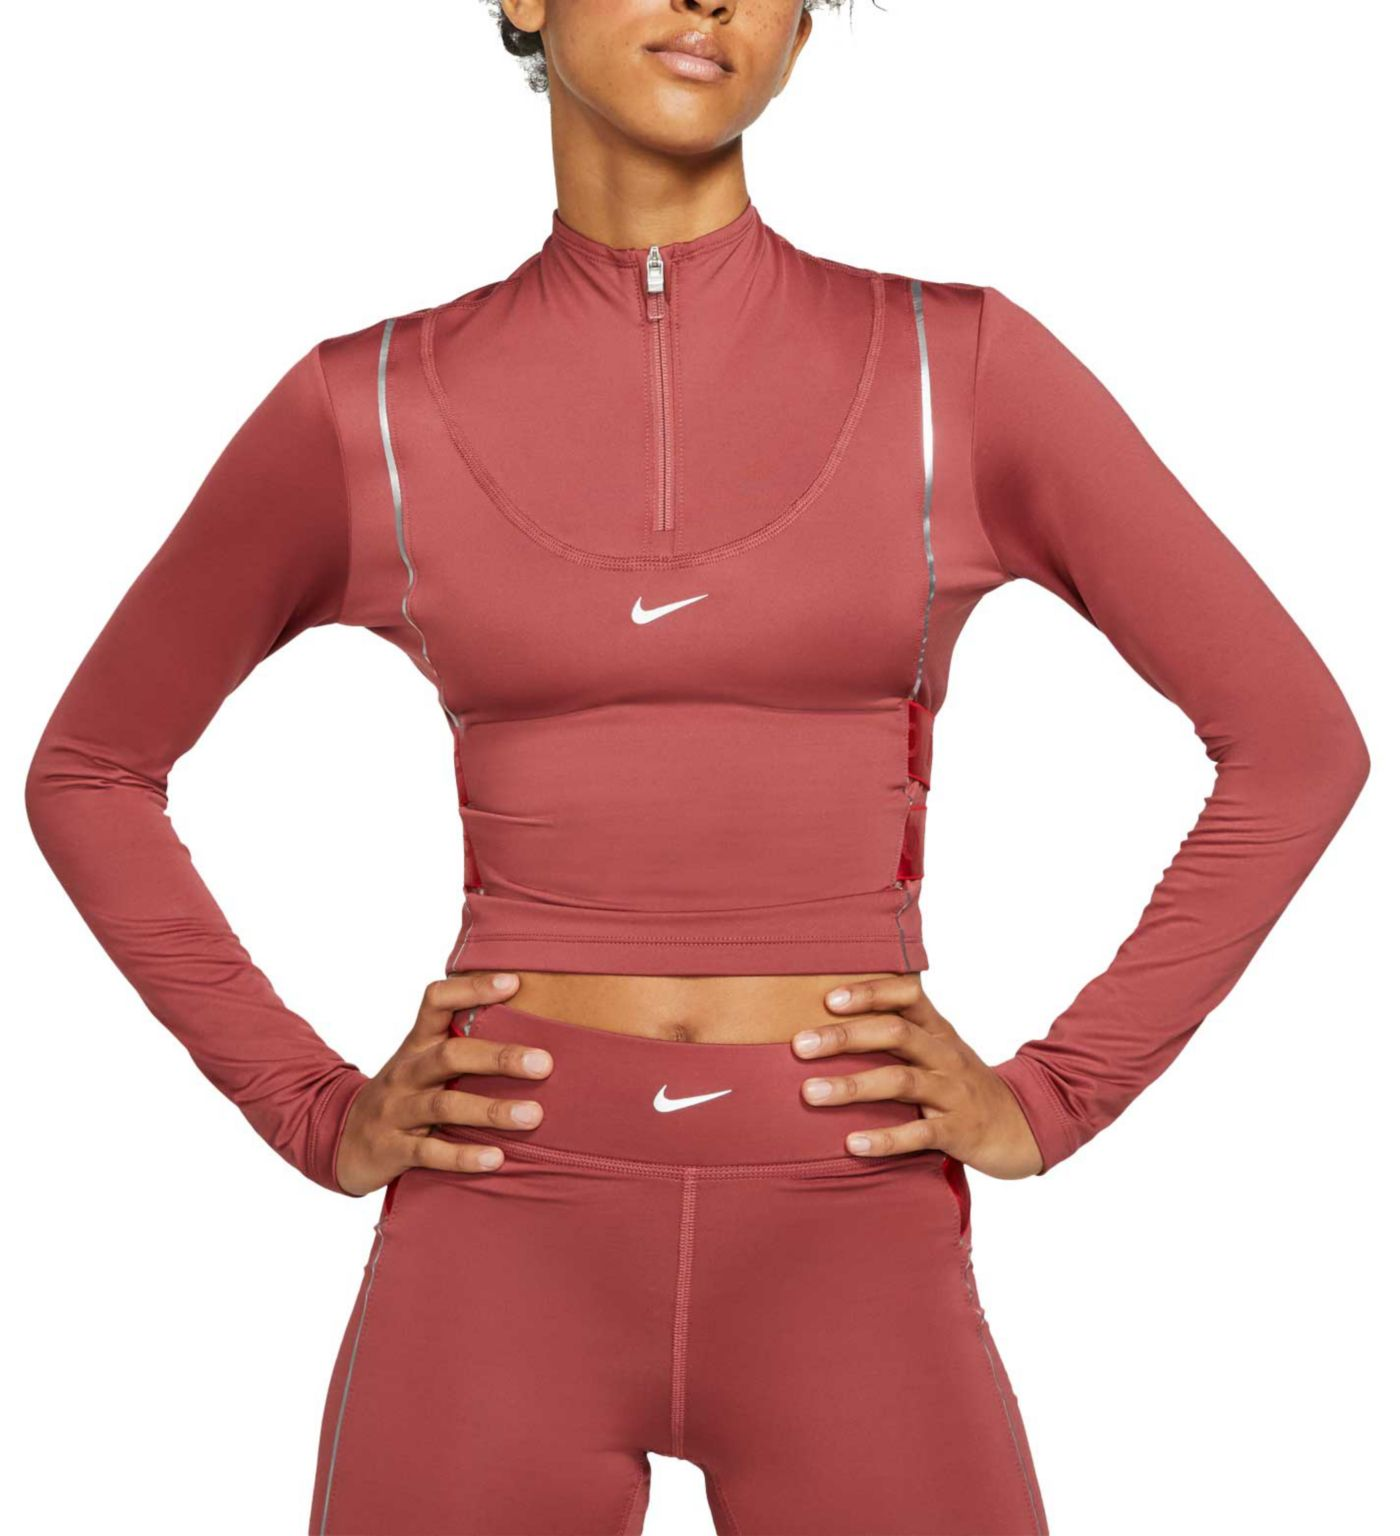 Nike Pro Women's HyperWarm ½ Zip Long Sleeve Top